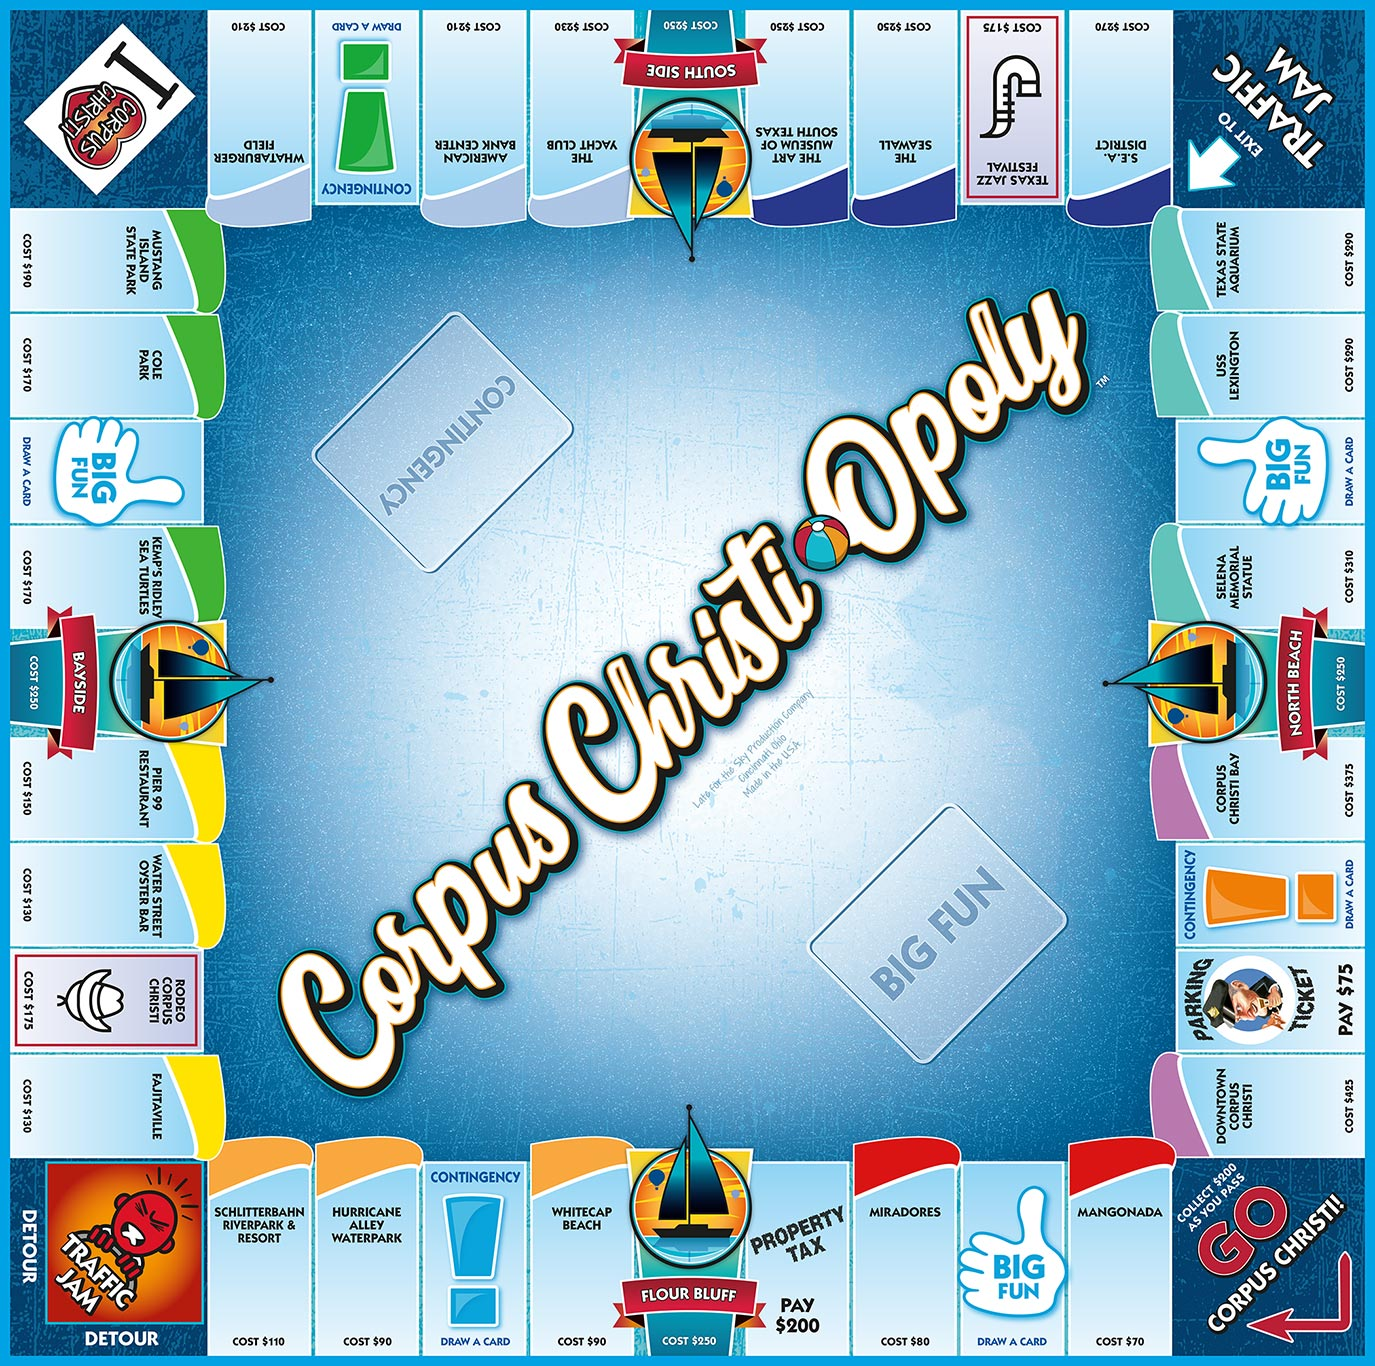 CORPUS CHRISTI-OPOLY Board Game